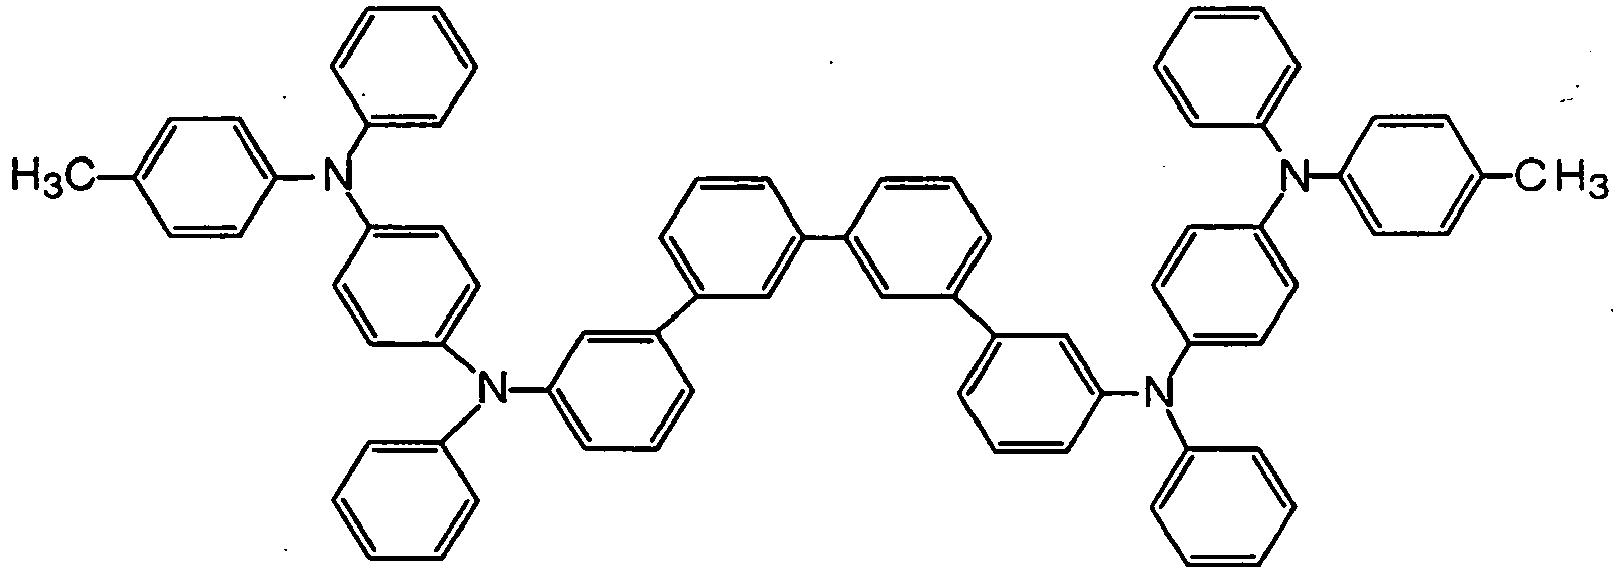 Figure imgb0928